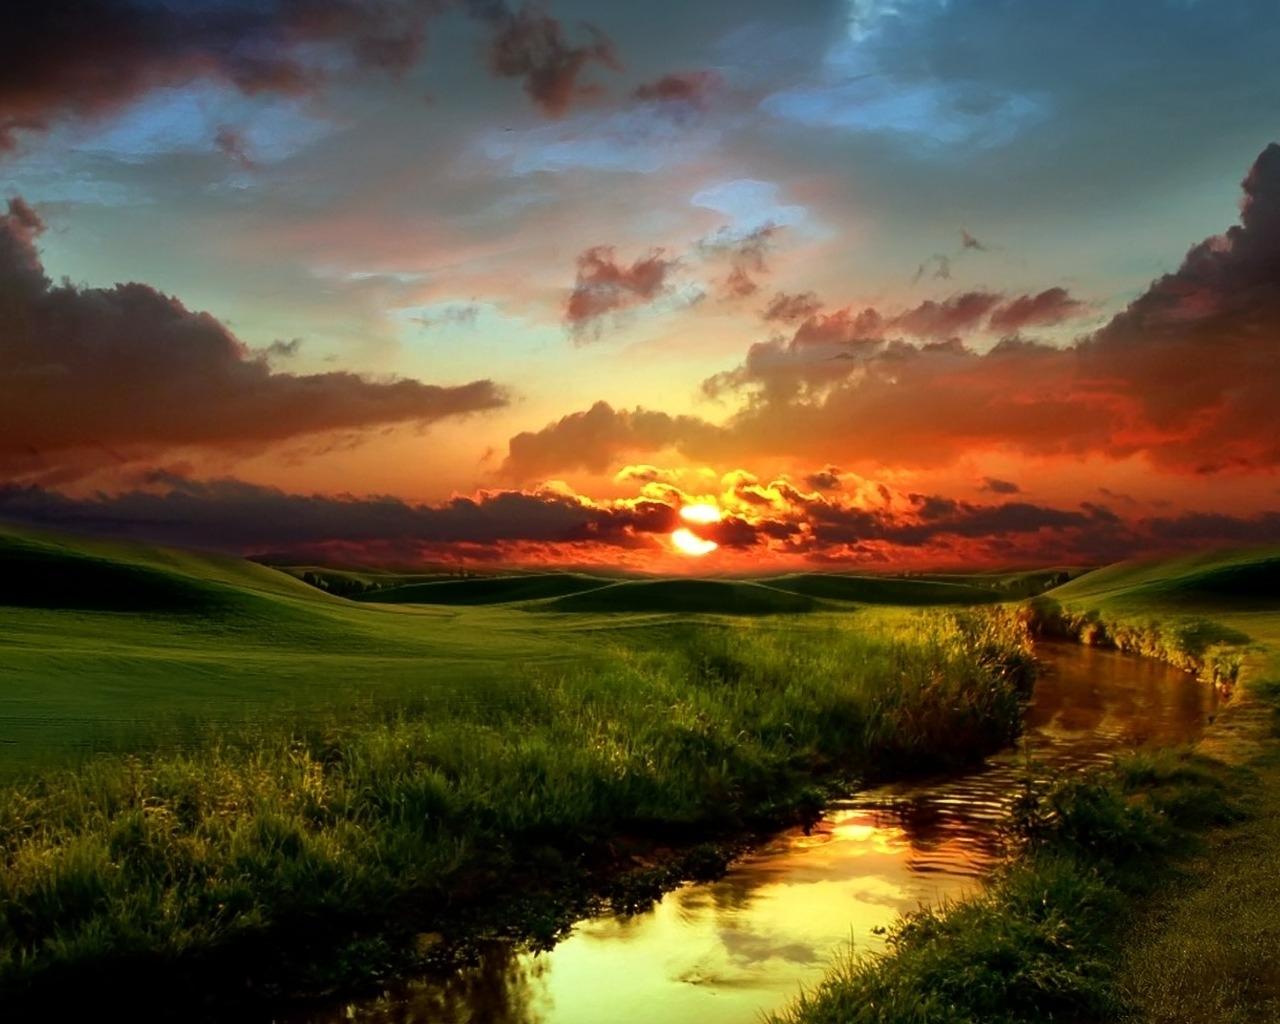 2730 скачать обои Пейзаж, Река, Закат, Трава, Небо, Солнце - заставки и картинки бесплатно